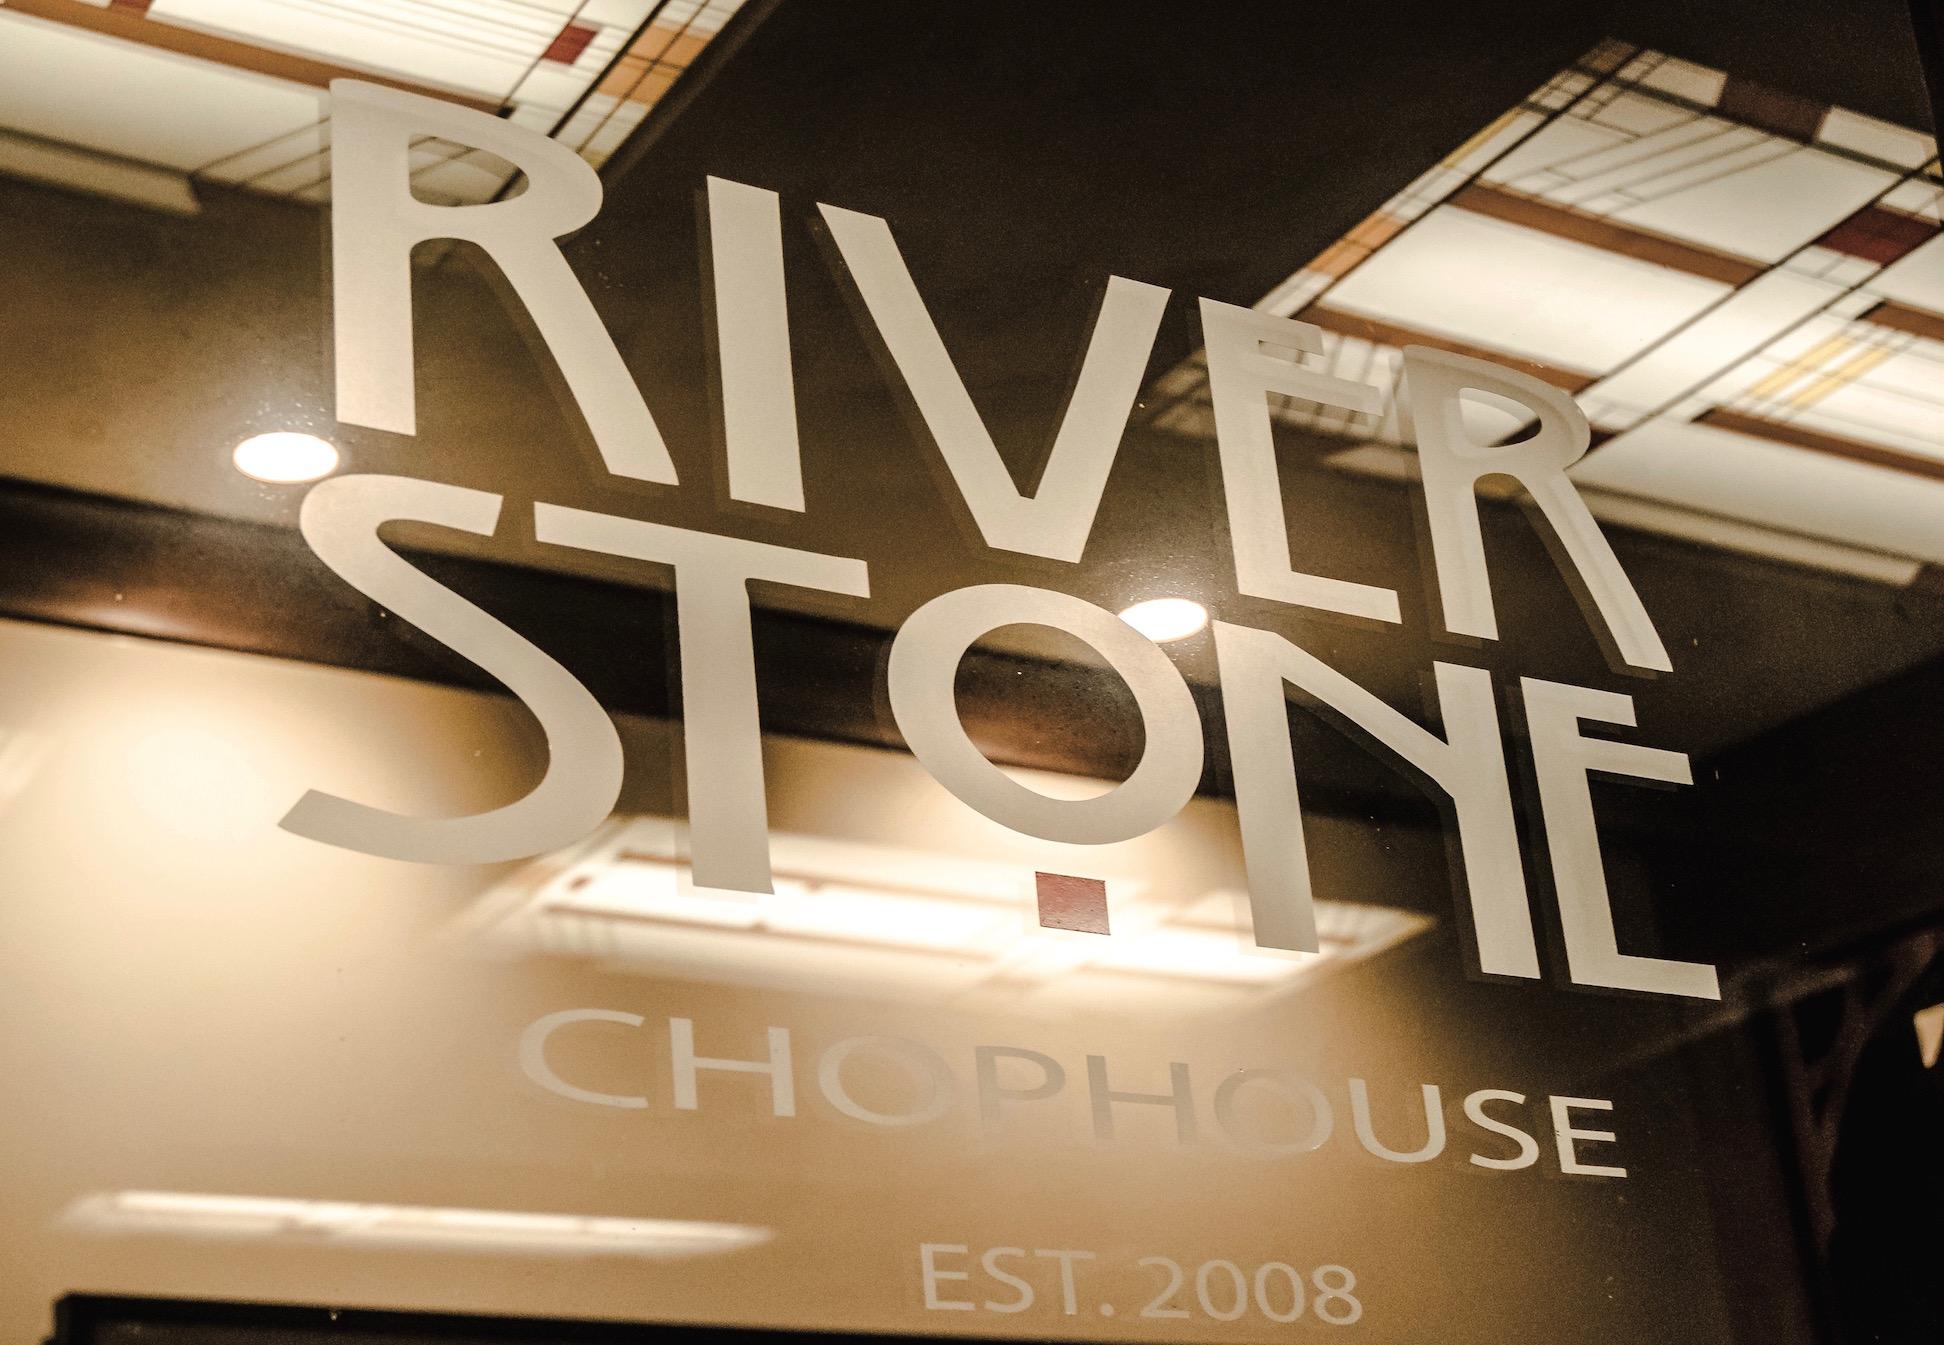 Riverstone Chophouse Suffolk, Virginia